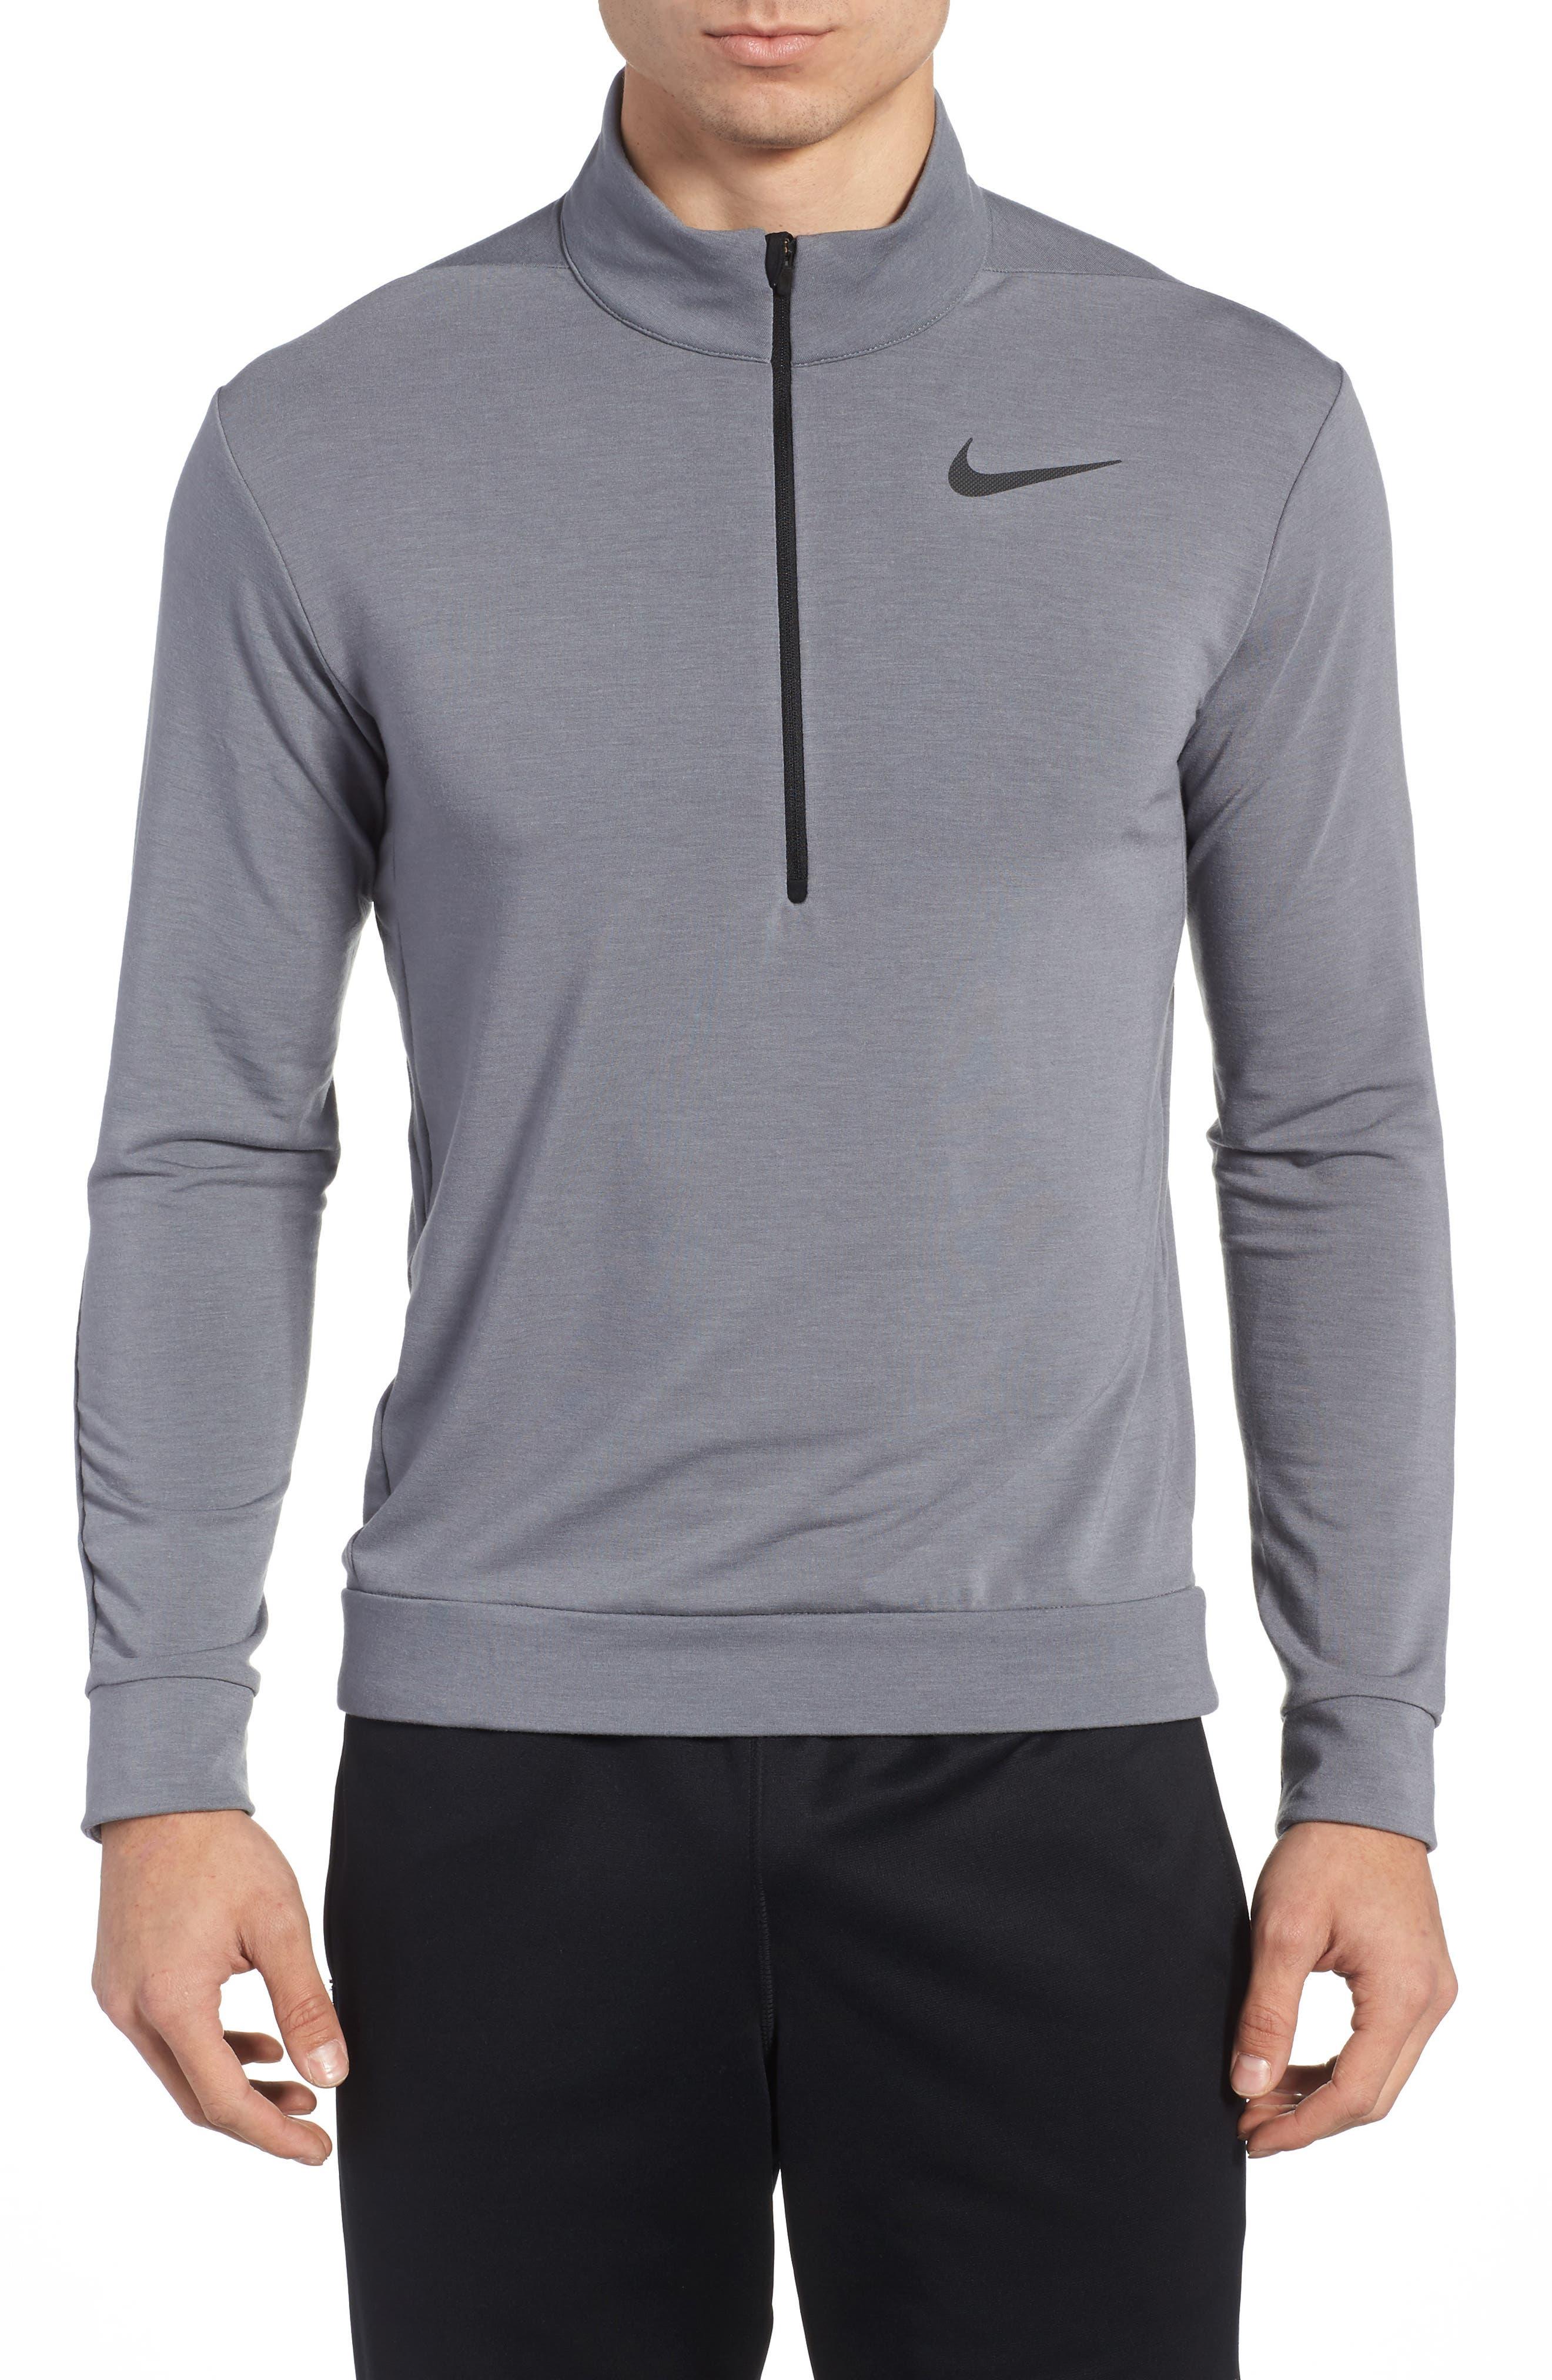 Alternate Image 1 Selected - Nike Dry Training Quarter Zip Pullover